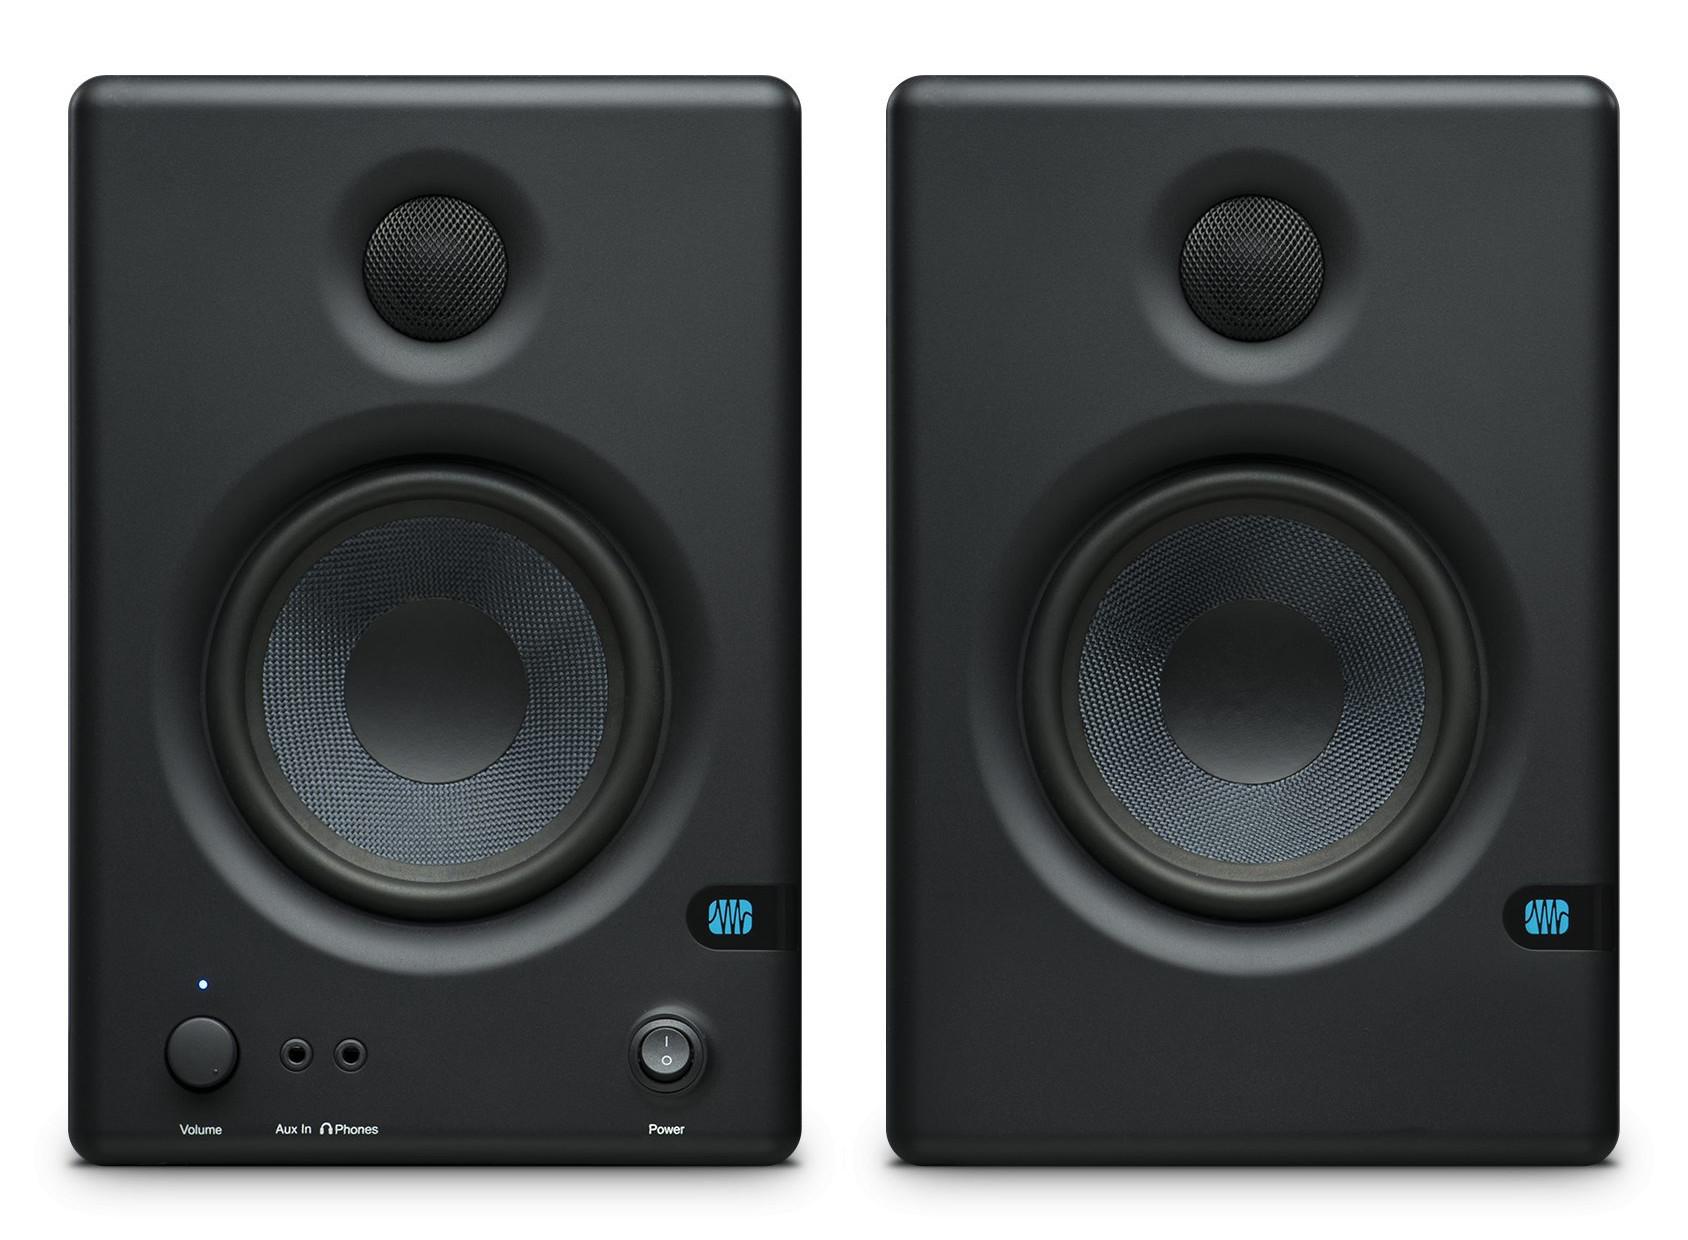 presonus eris e4 5 compact studio monitors. Black Bedroom Furniture Sets. Home Design Ideas